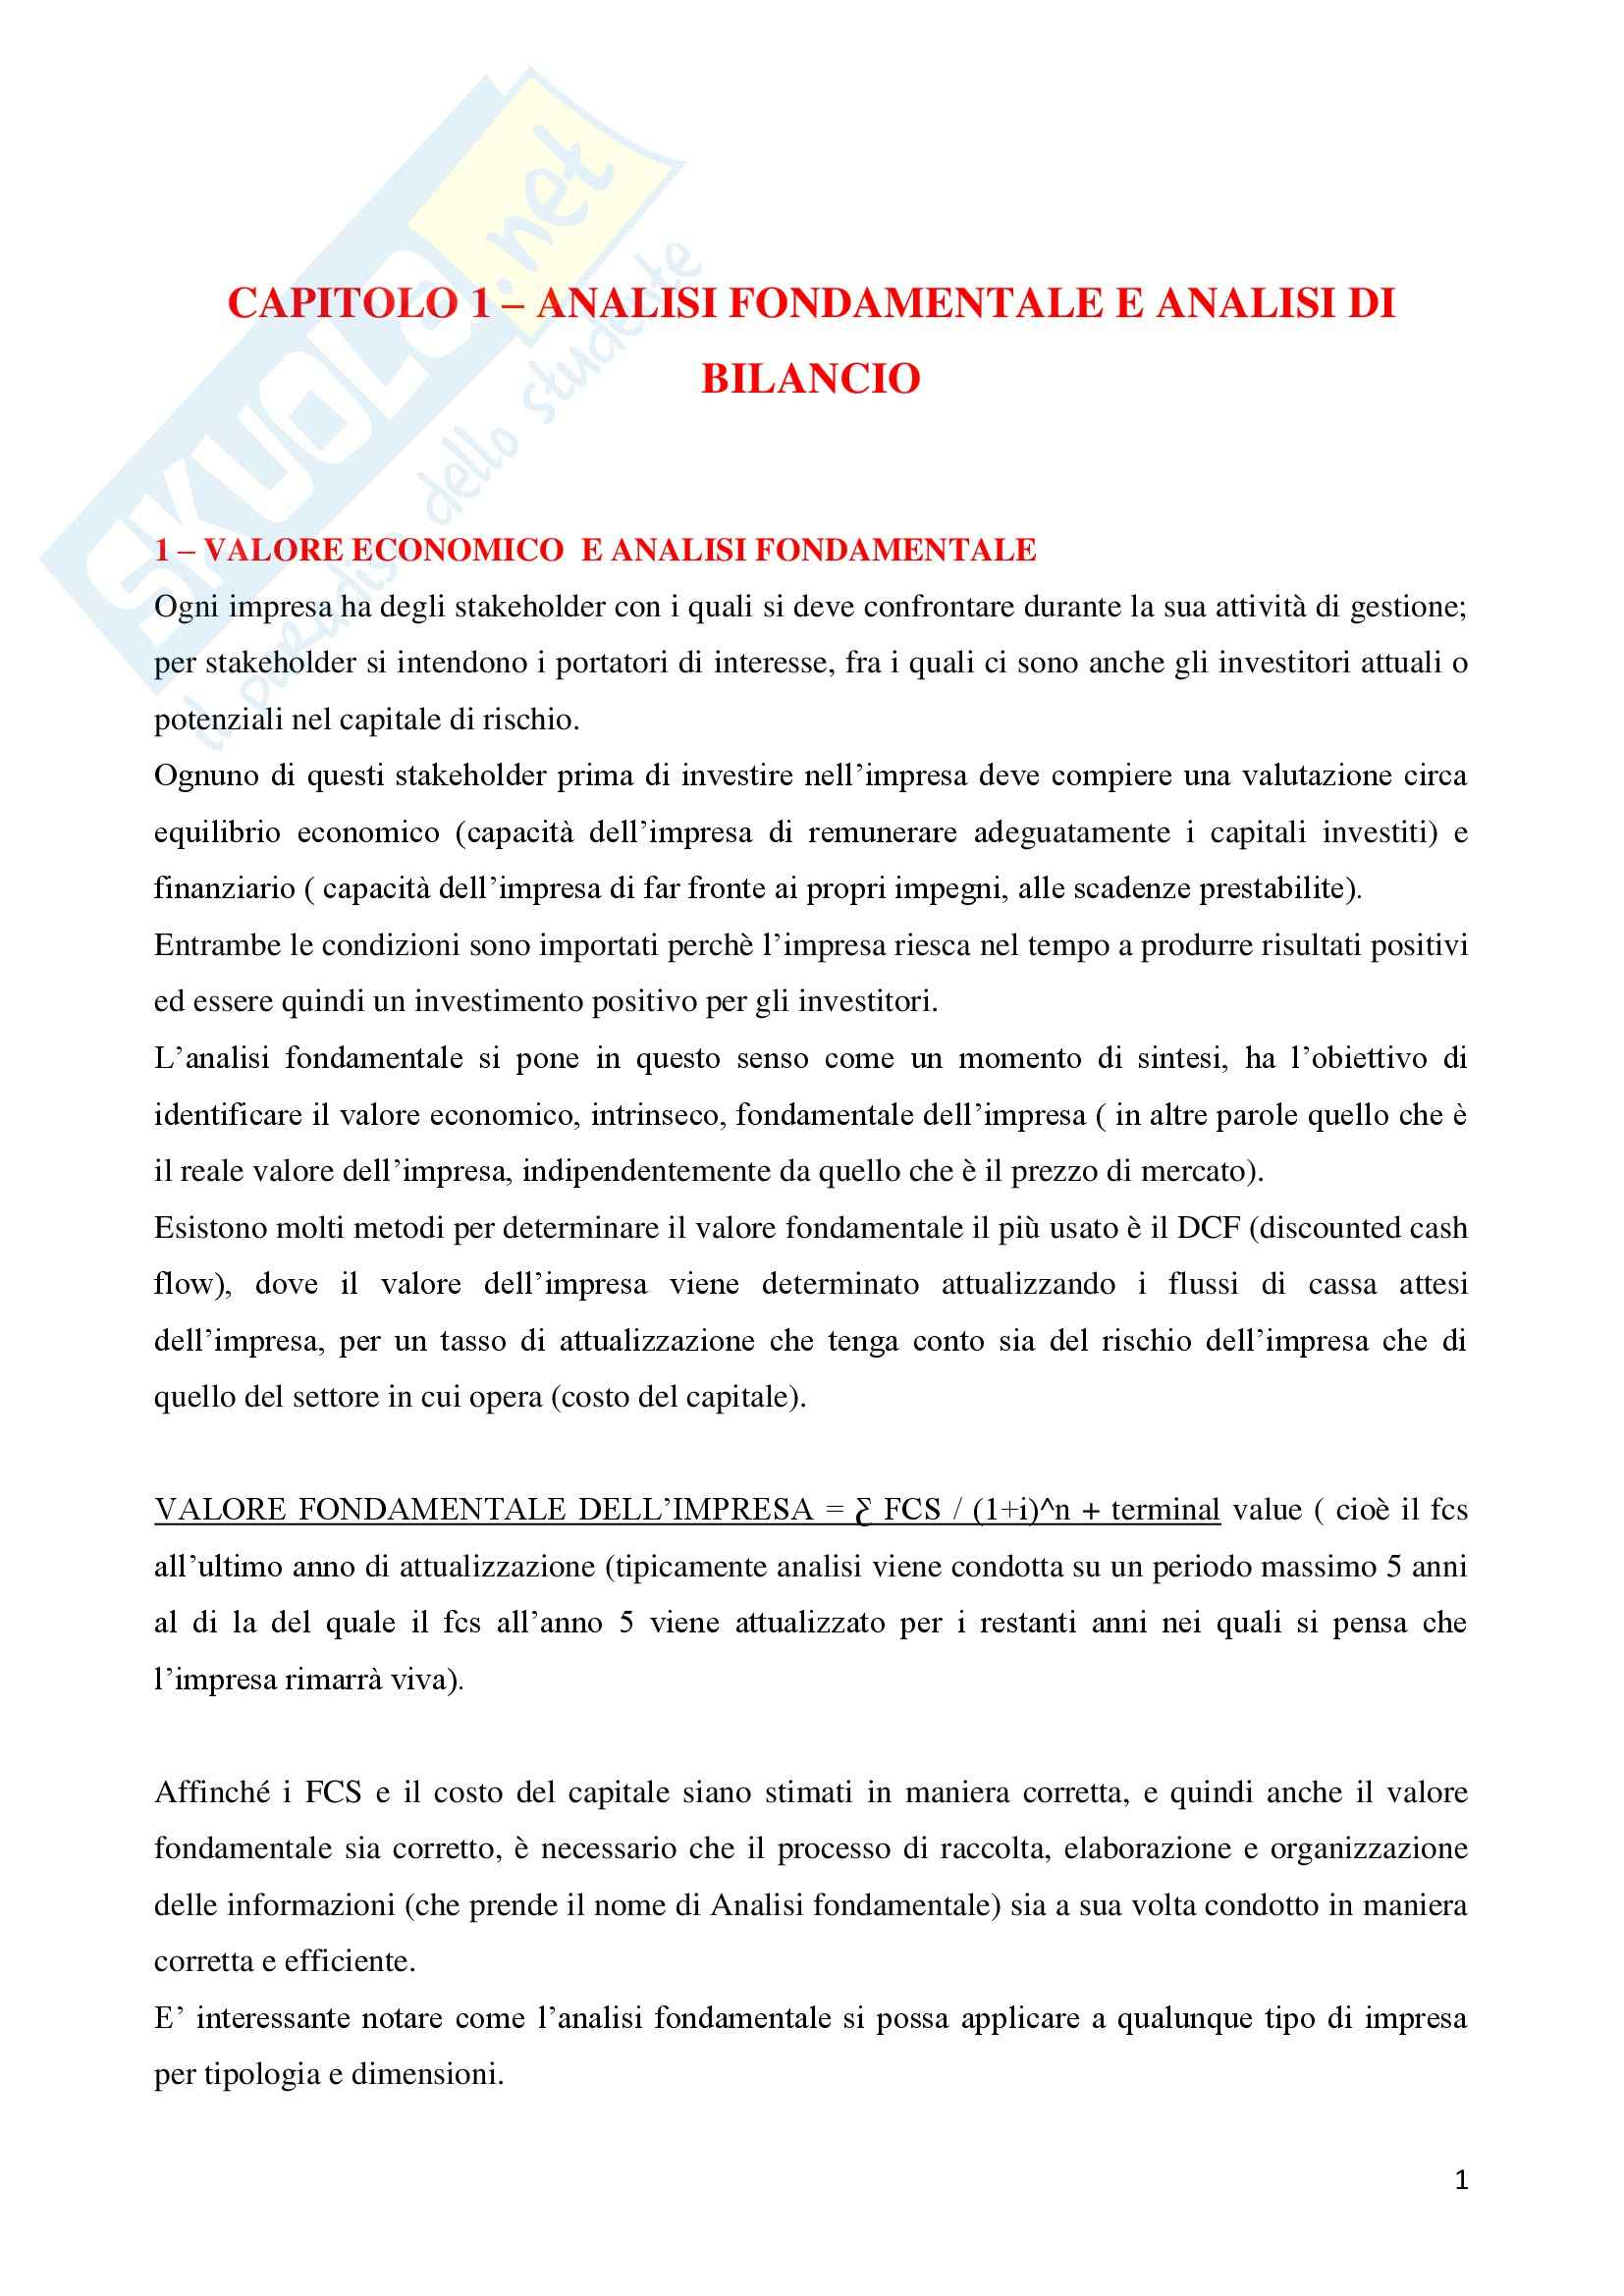 Riassunto esame Analisi di Bilancio, prof. Giunta